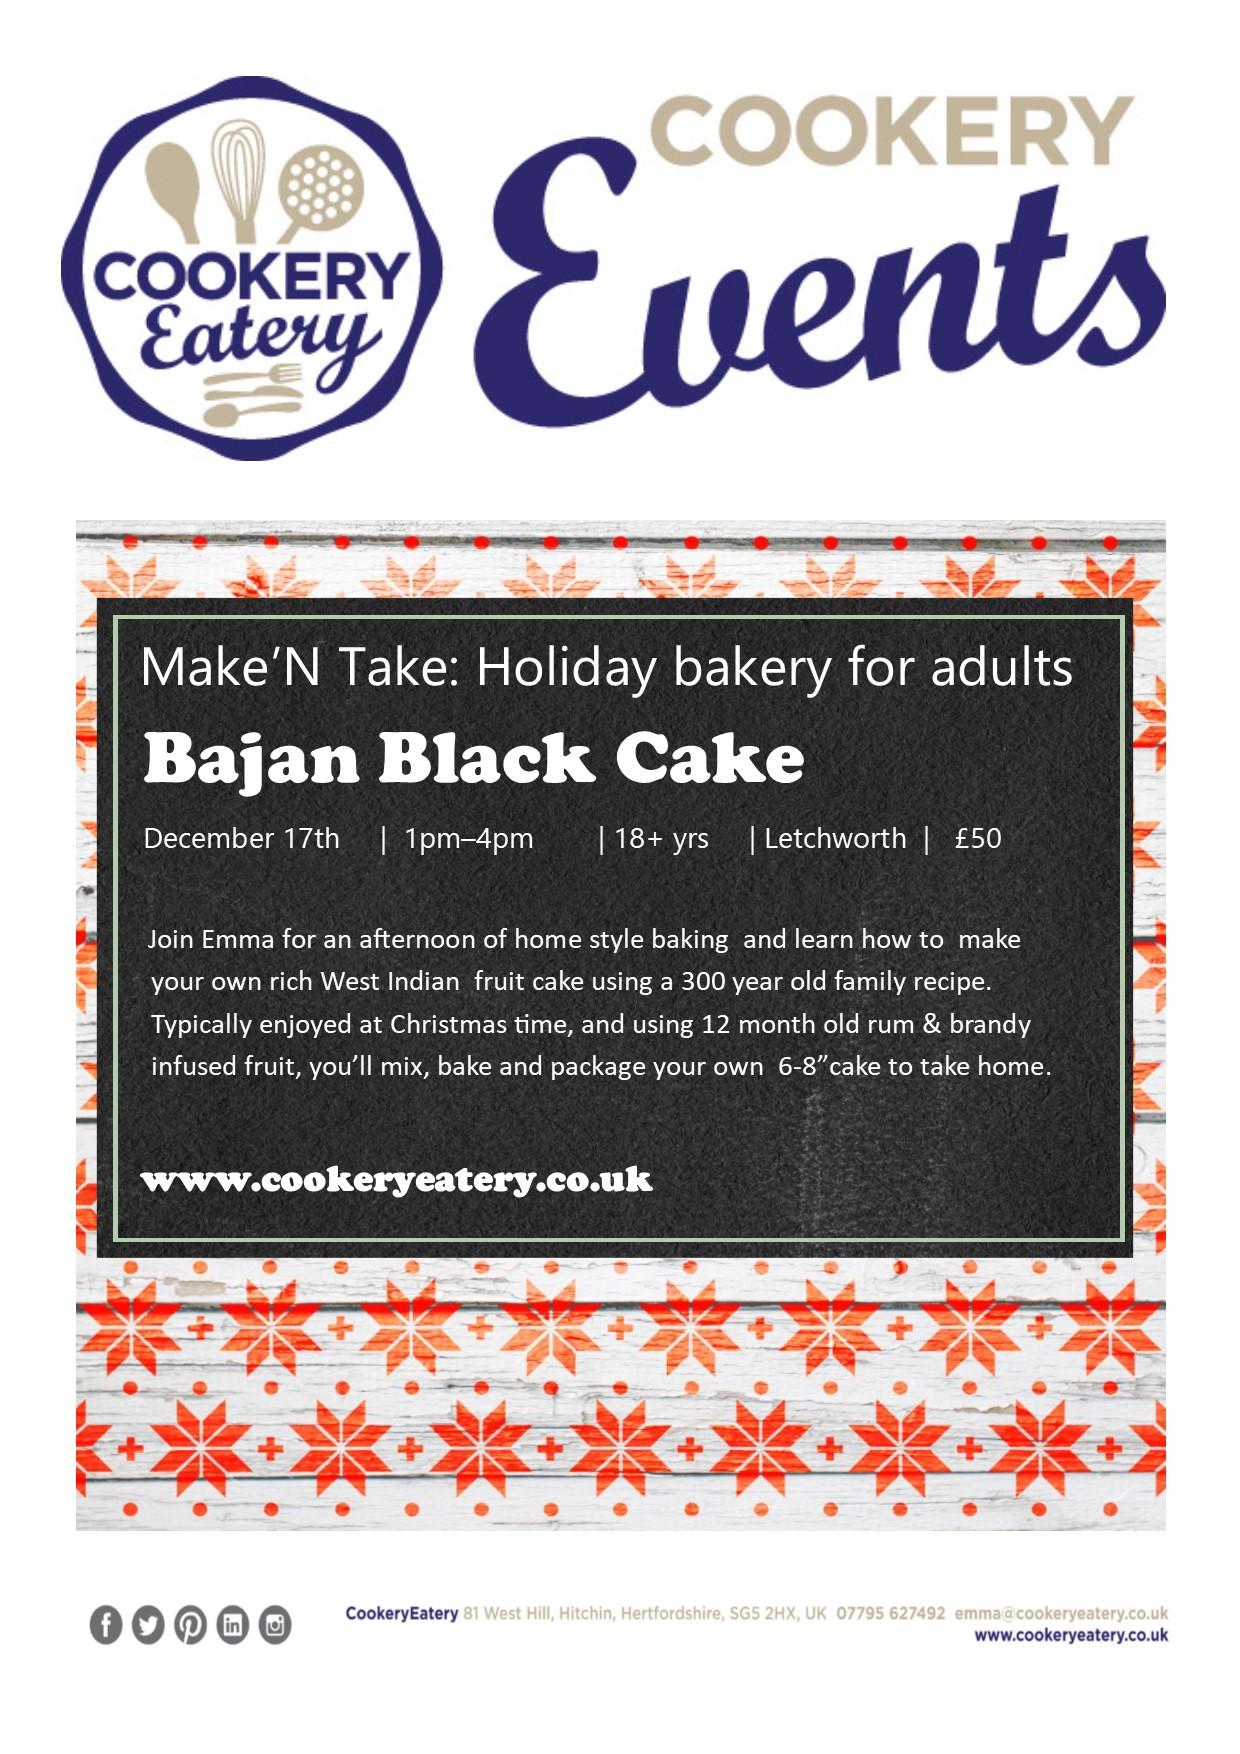 CookeryEatery.MAKE N TAKE. Holiday Bakery for Adults.Bajan Black Cake.Dec17.jpg